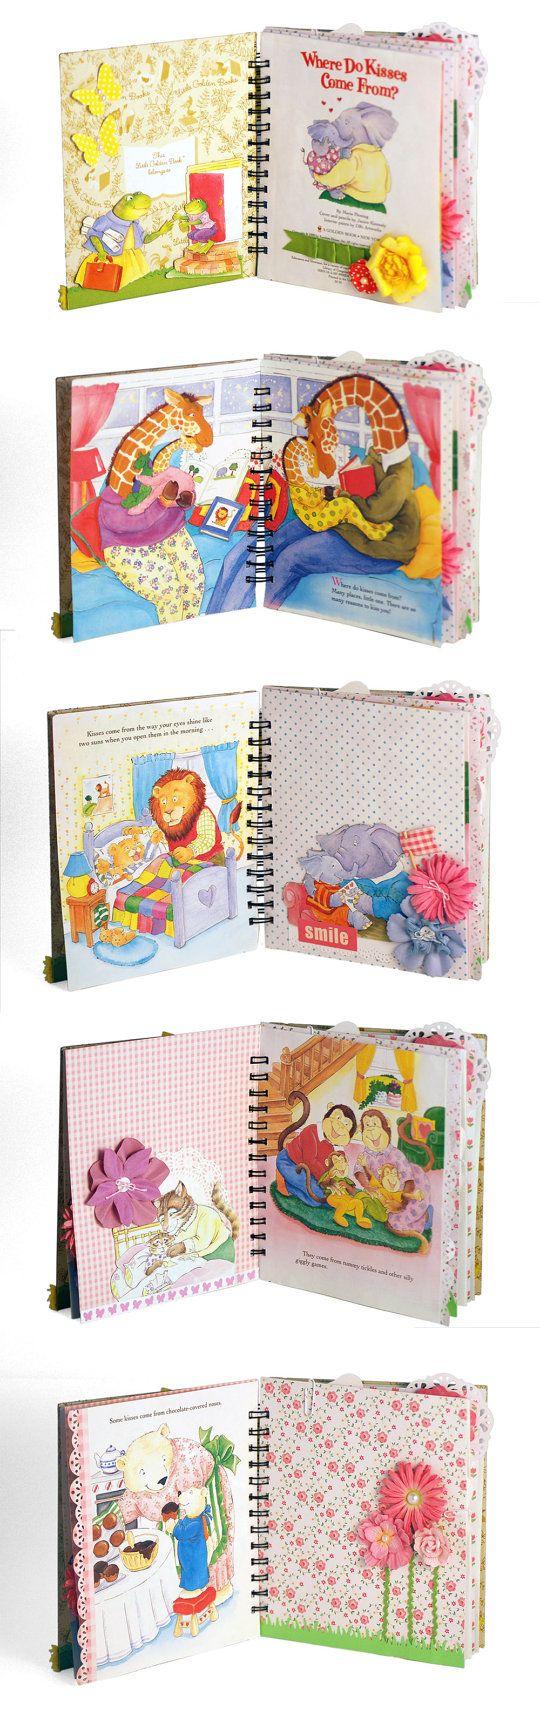 Scrapbook paper book - 1017 Best Images About Album Scrap On Pinterest Scrapbook Albums Baby Album And Mini Scrapbooks